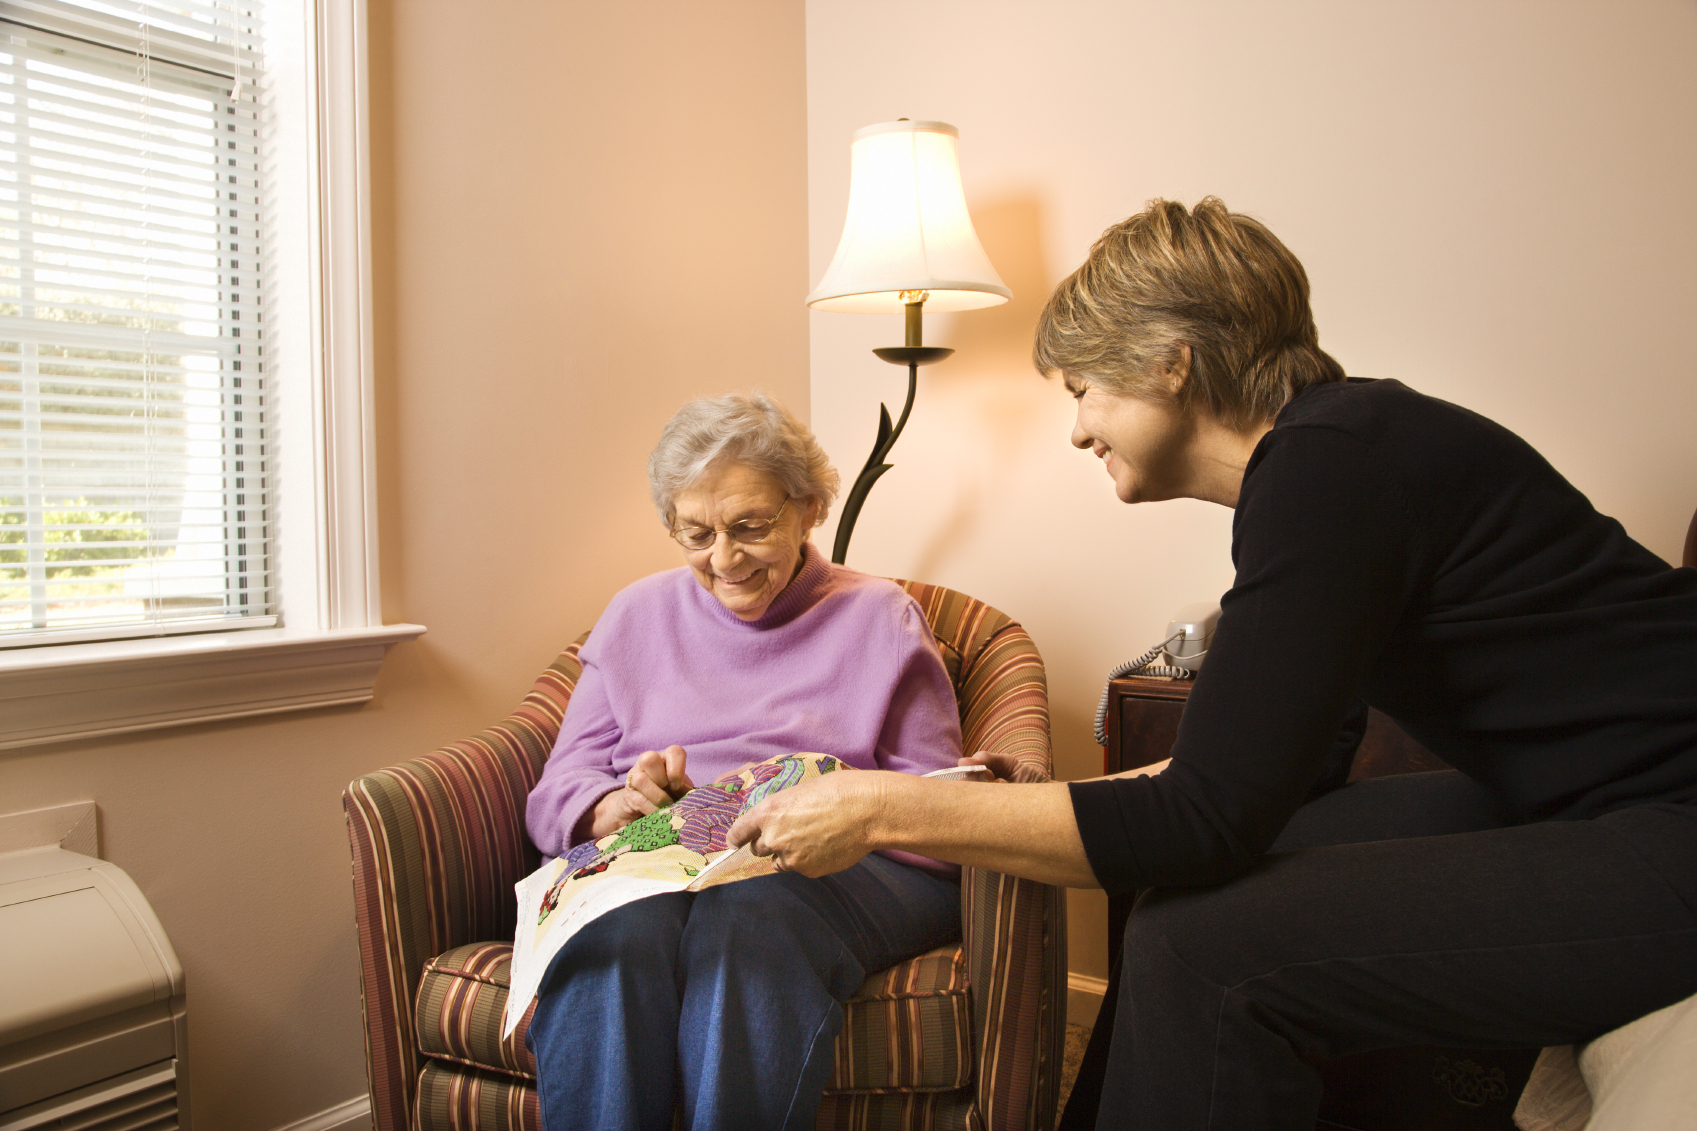 mlmsi_dallas_home_health_care_hospice_elder_patient.jpg